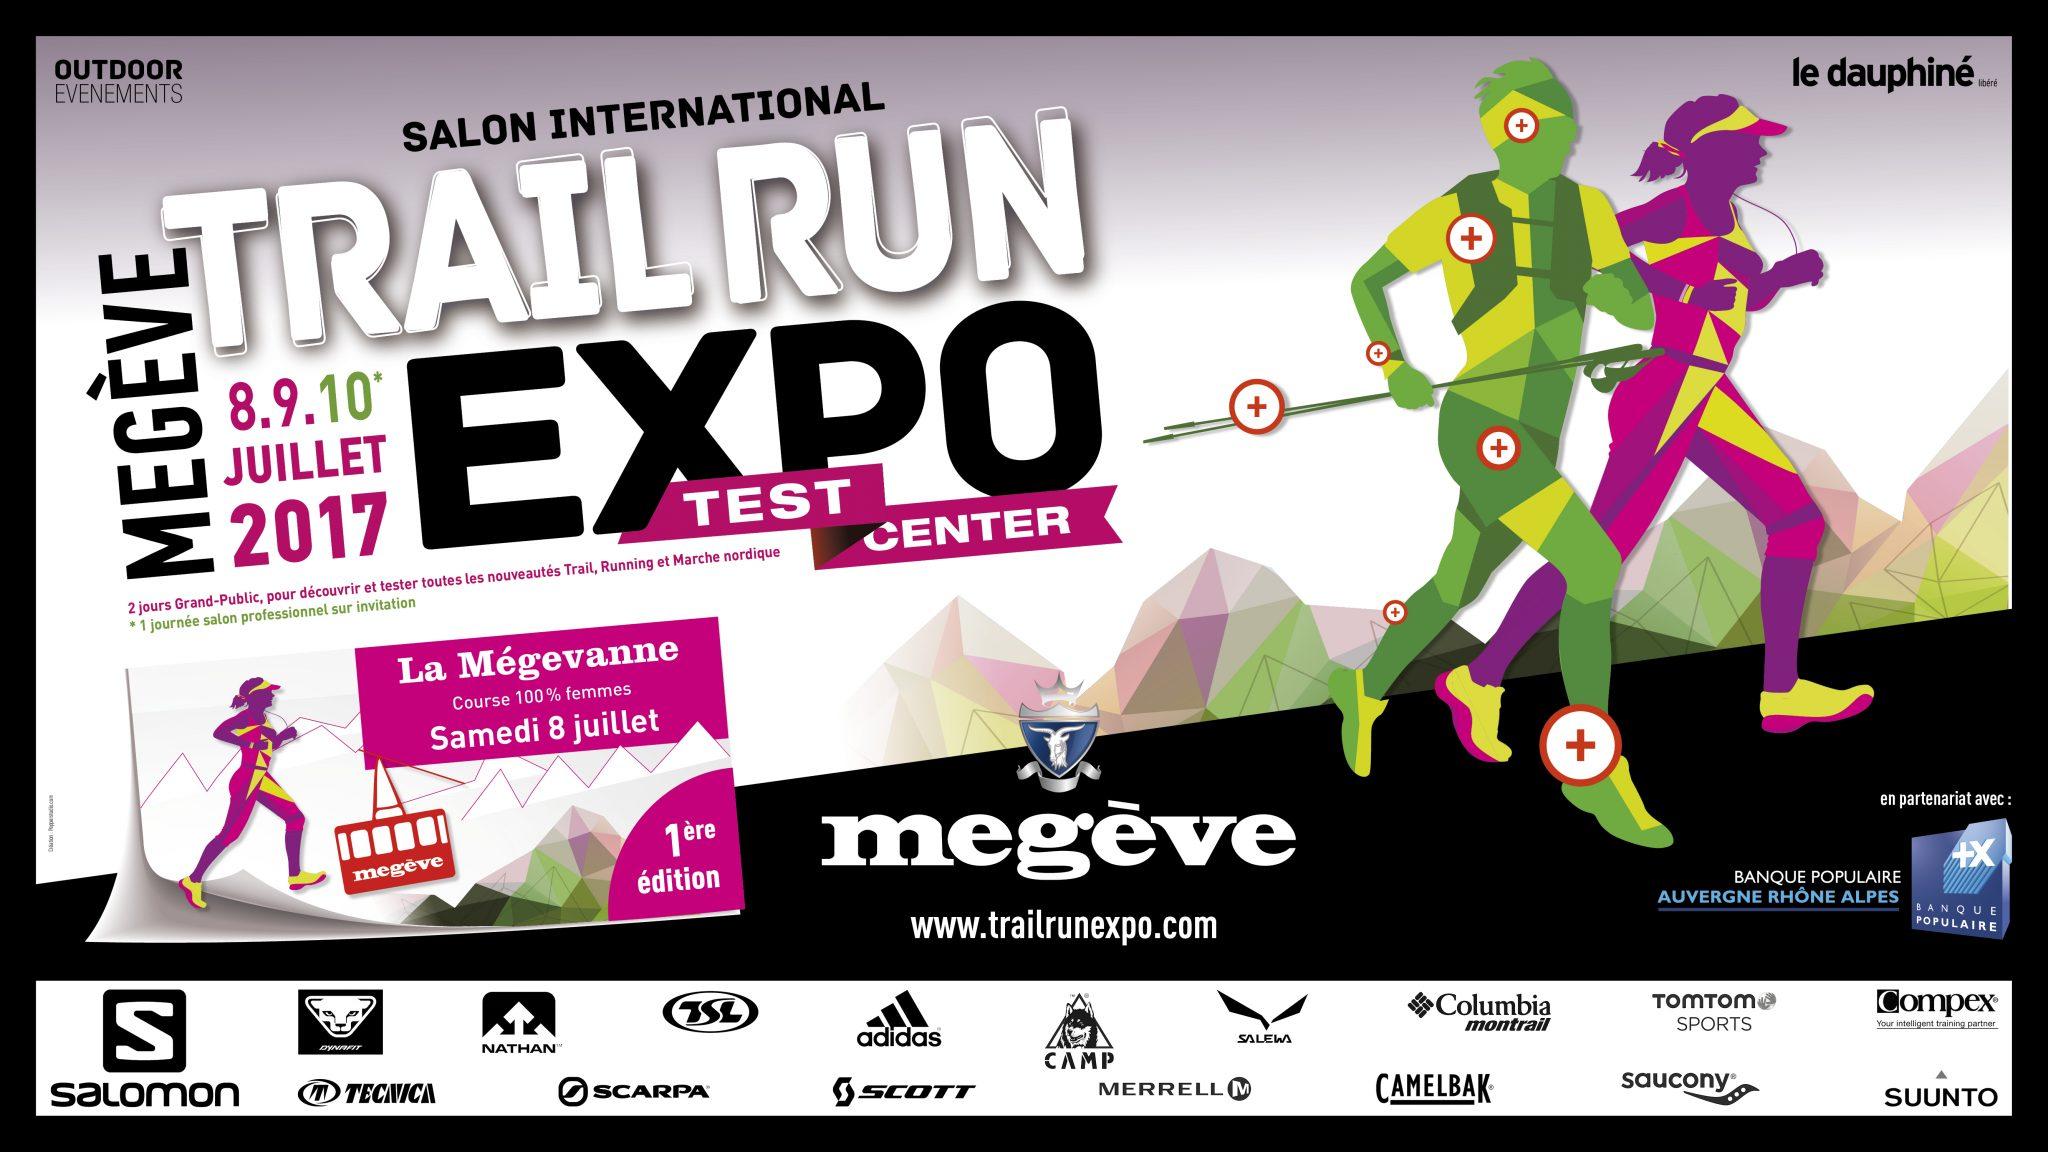 trail-femmes-happy-women-mountains-running-trail-femmes-montagne-salon-essais-chaussures-matériel-équipement